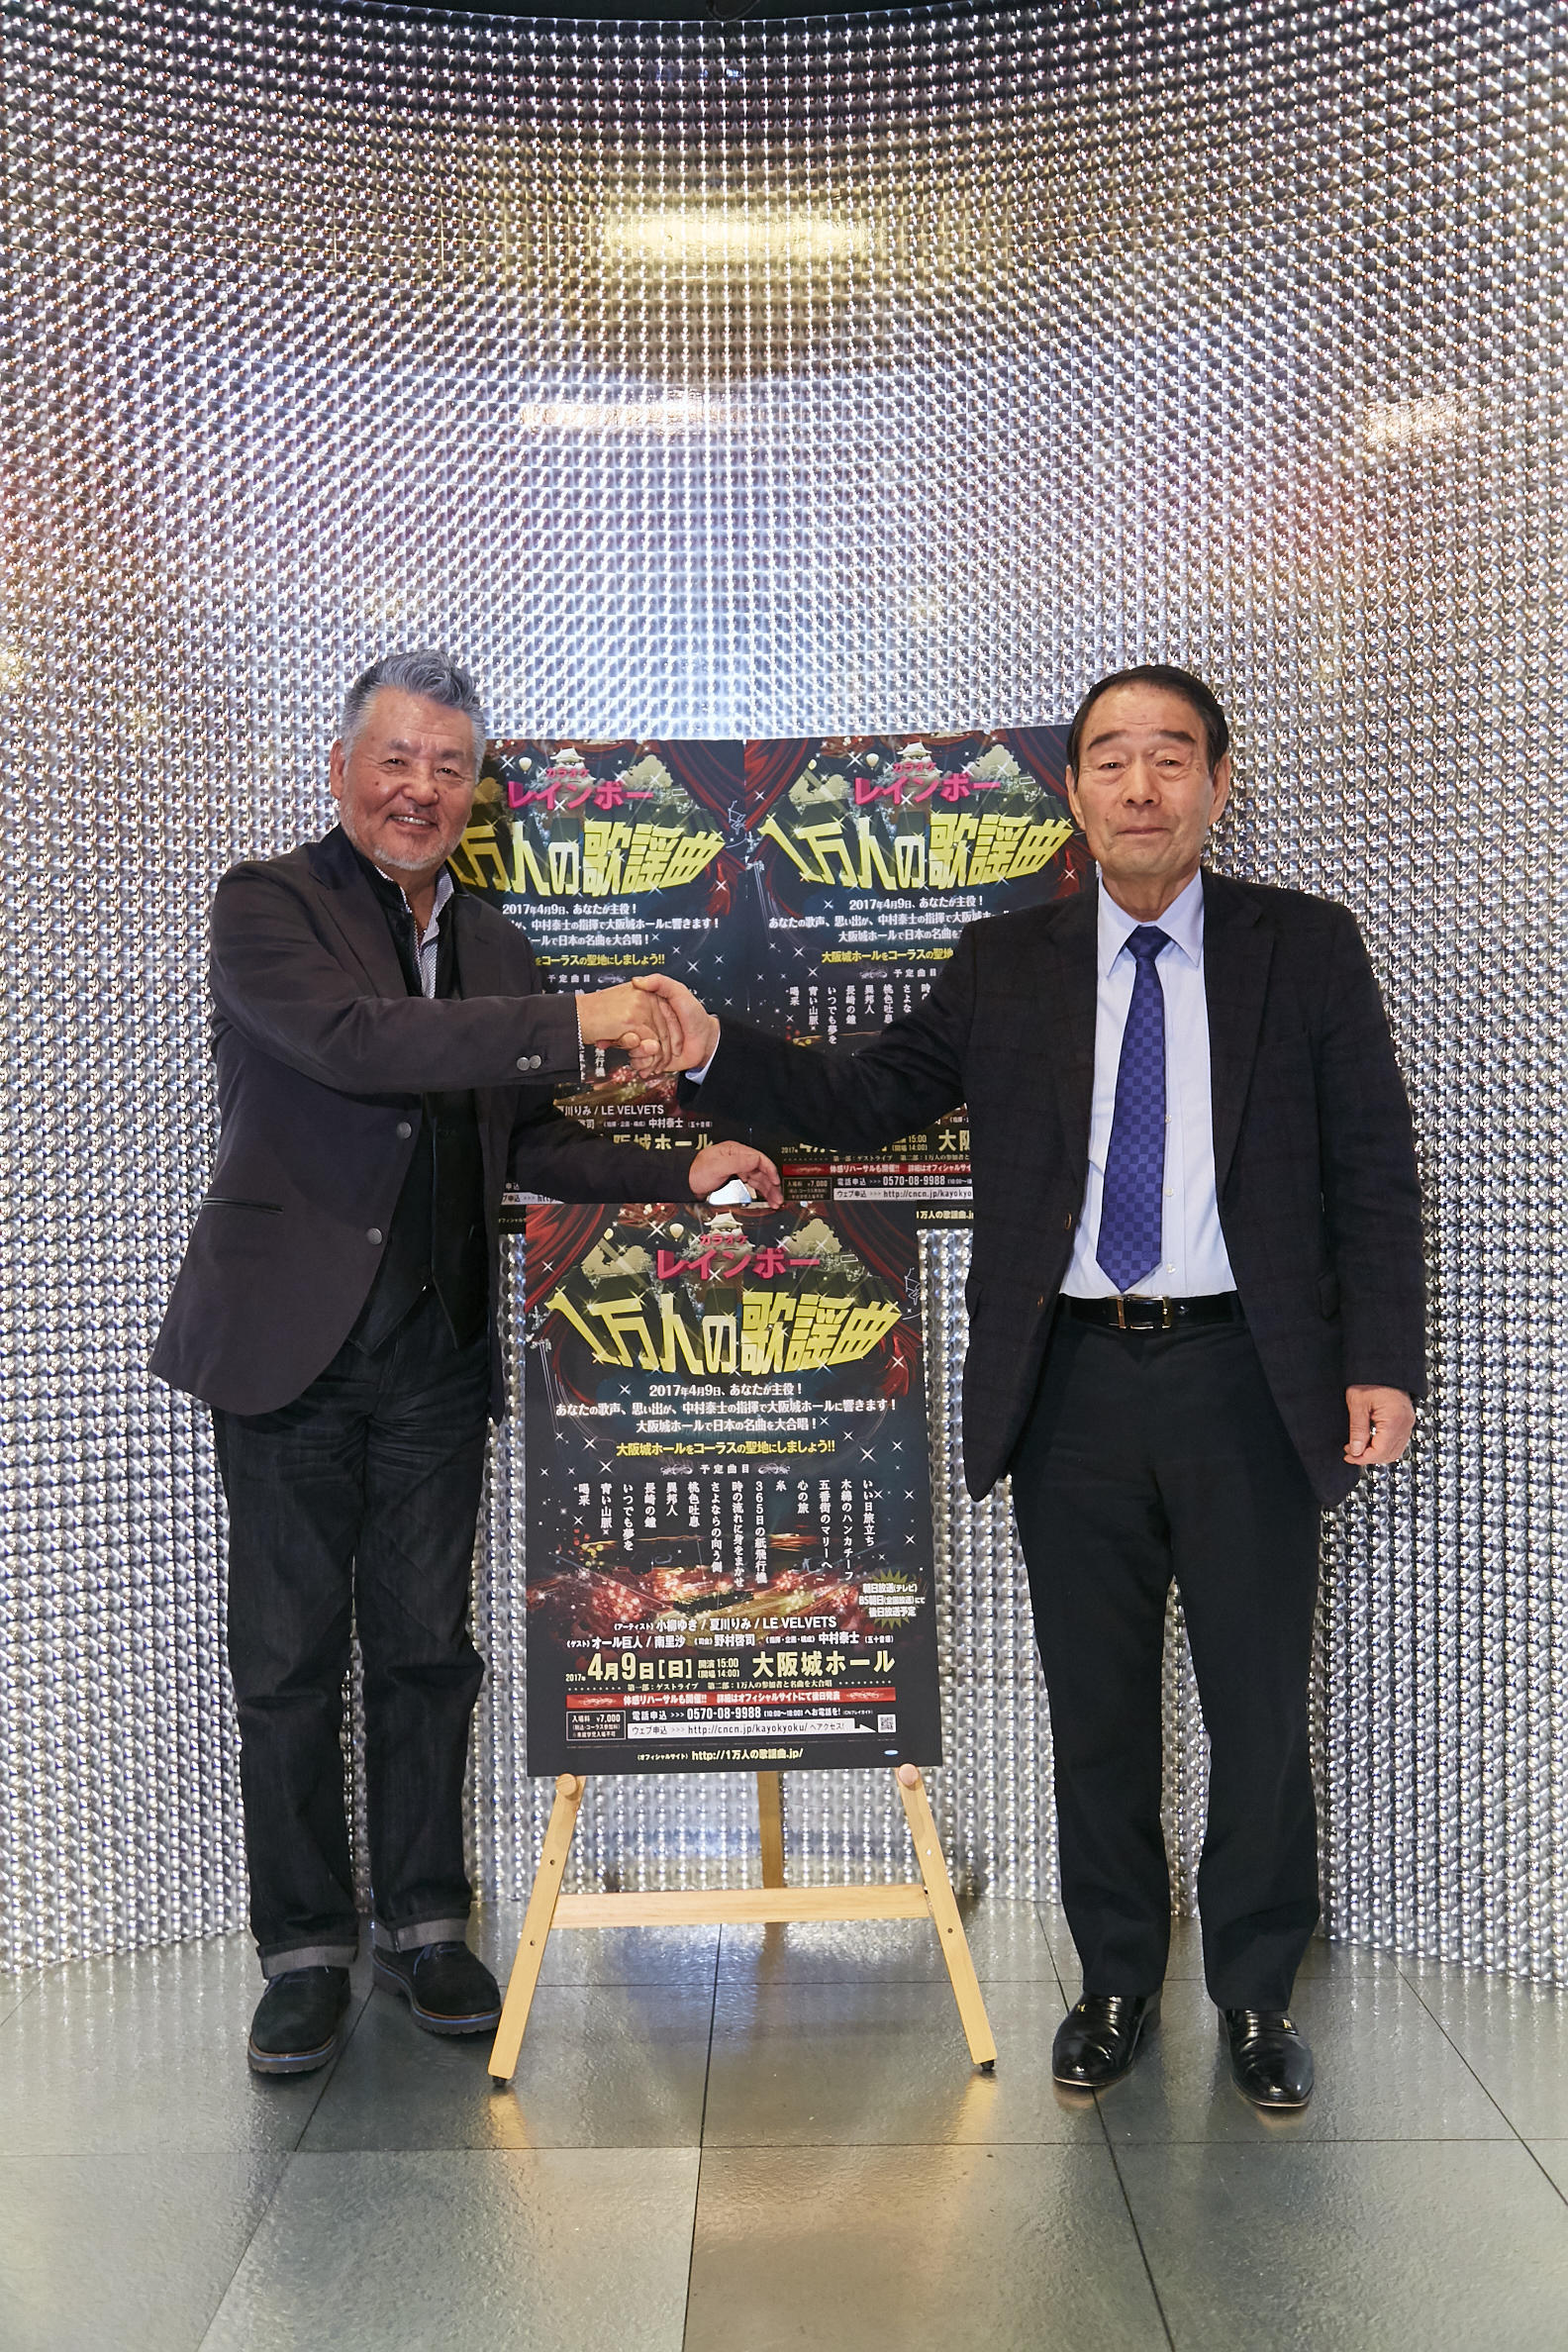 http://news.yoshimoto.co.jp/20170208214432-ebc7921d621eff02a0d92ef224fd8ae554855d9e.jpg